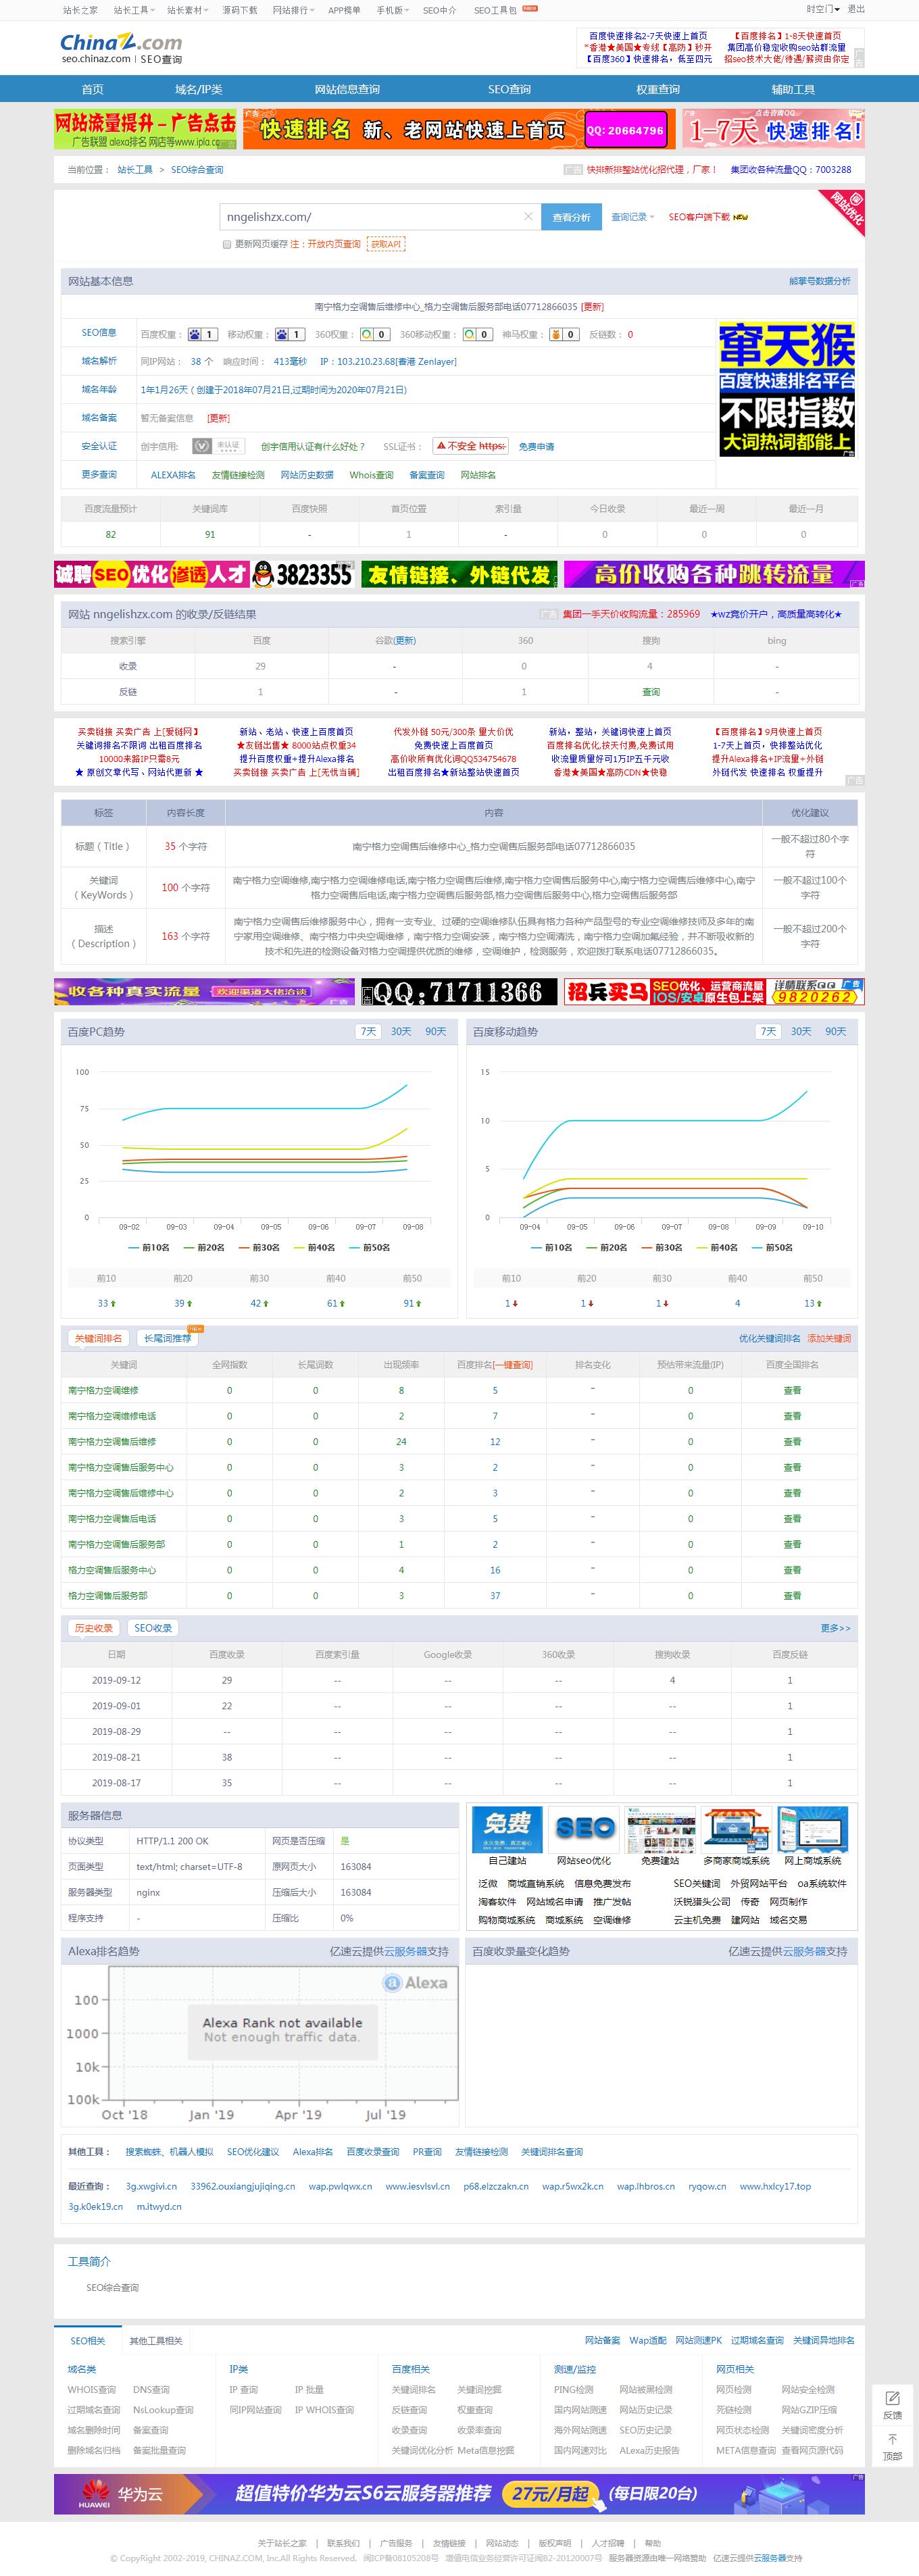 2019.9.16nngelishzx.comsbf888胜博发格力空调售后维修中心的SEO综合查询 - 站长工具.png